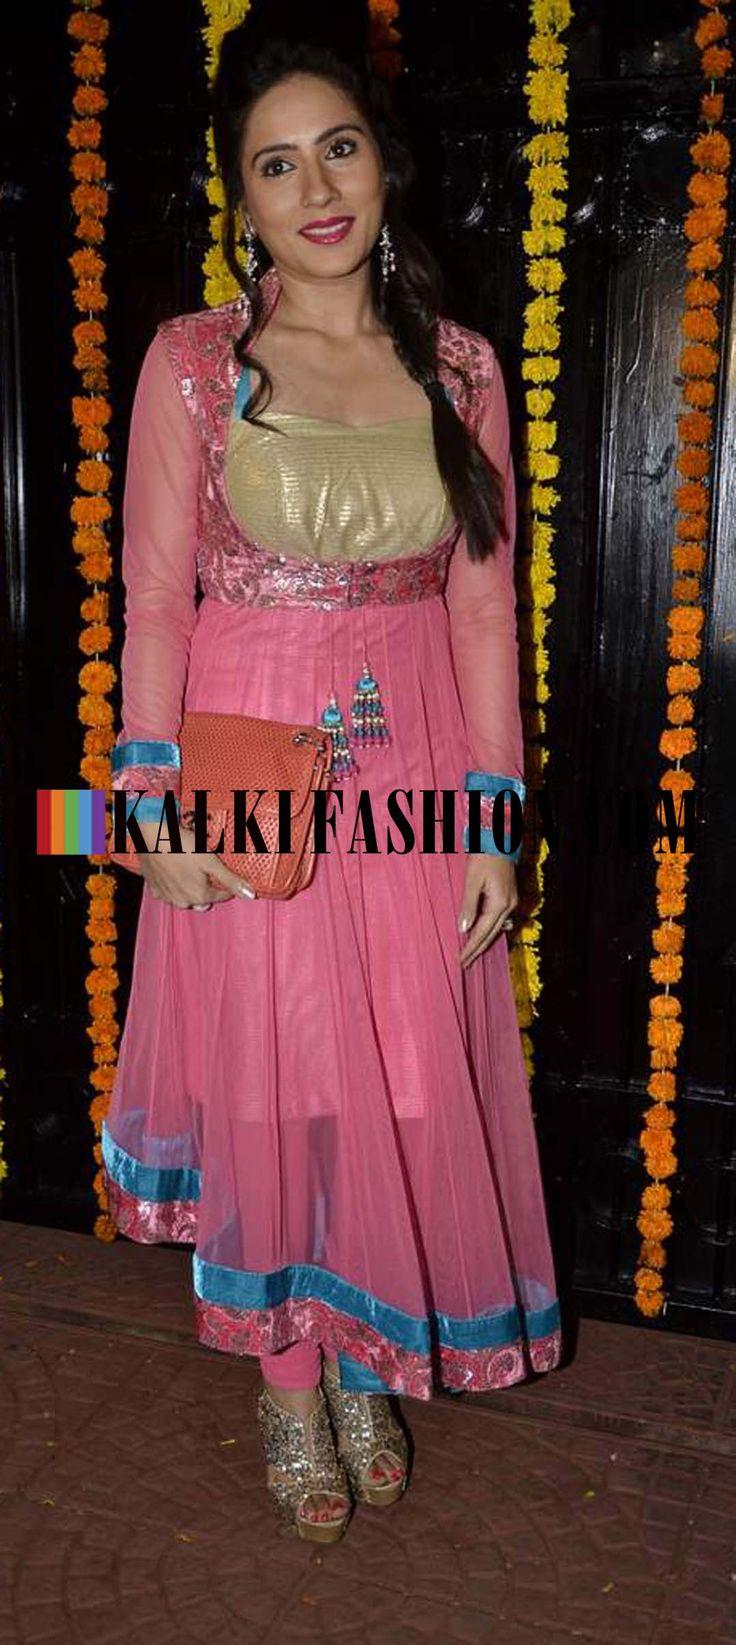 Sumeet Kant Kaul   KaulKant    Twitter Did you know   Rani Mukerji was the first choice over Priyanka Chopra for  Mary Kom